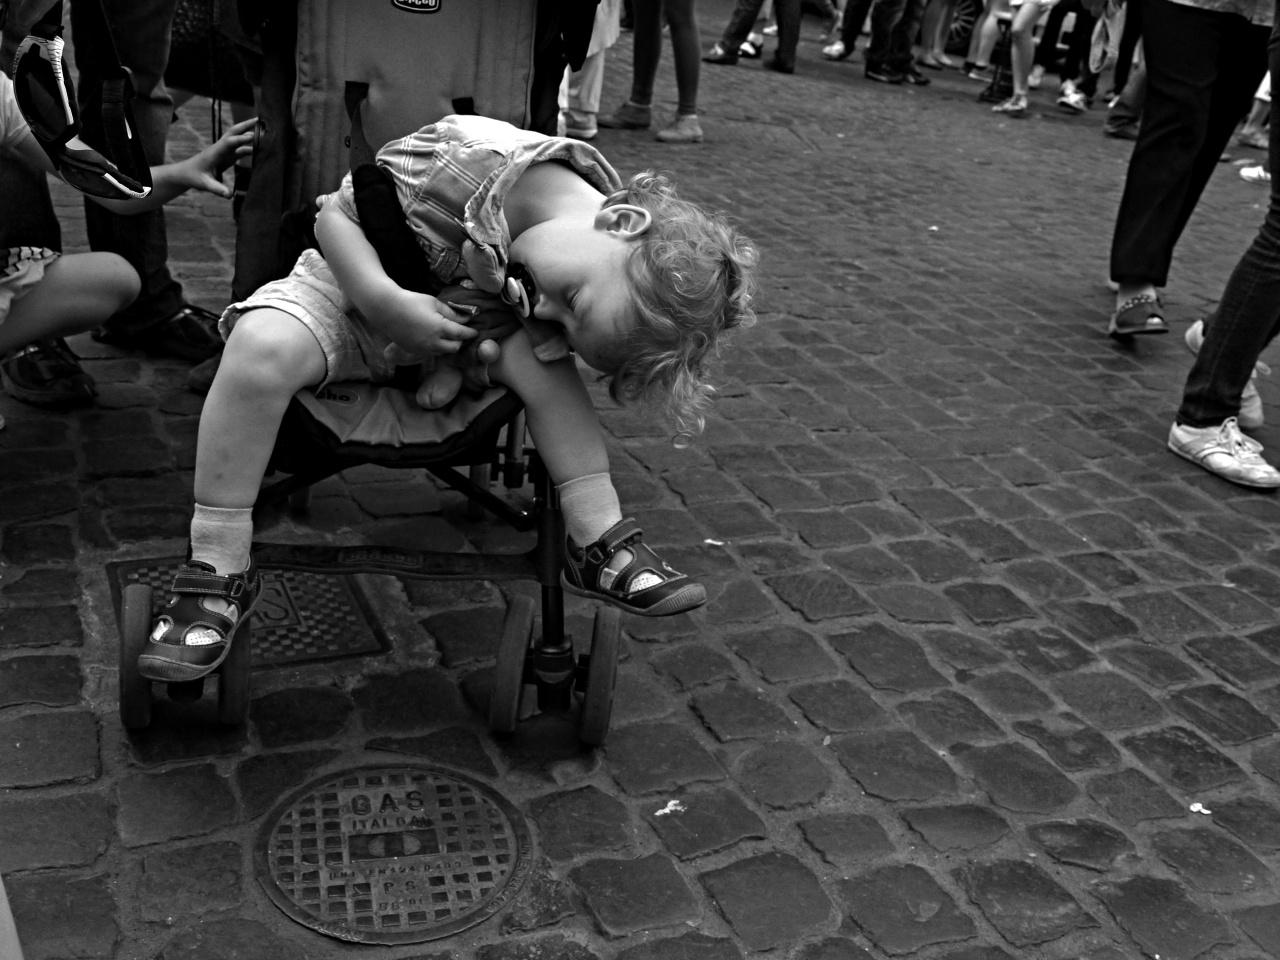 copyright Amos Farnitano - www.amosfarnitano.it